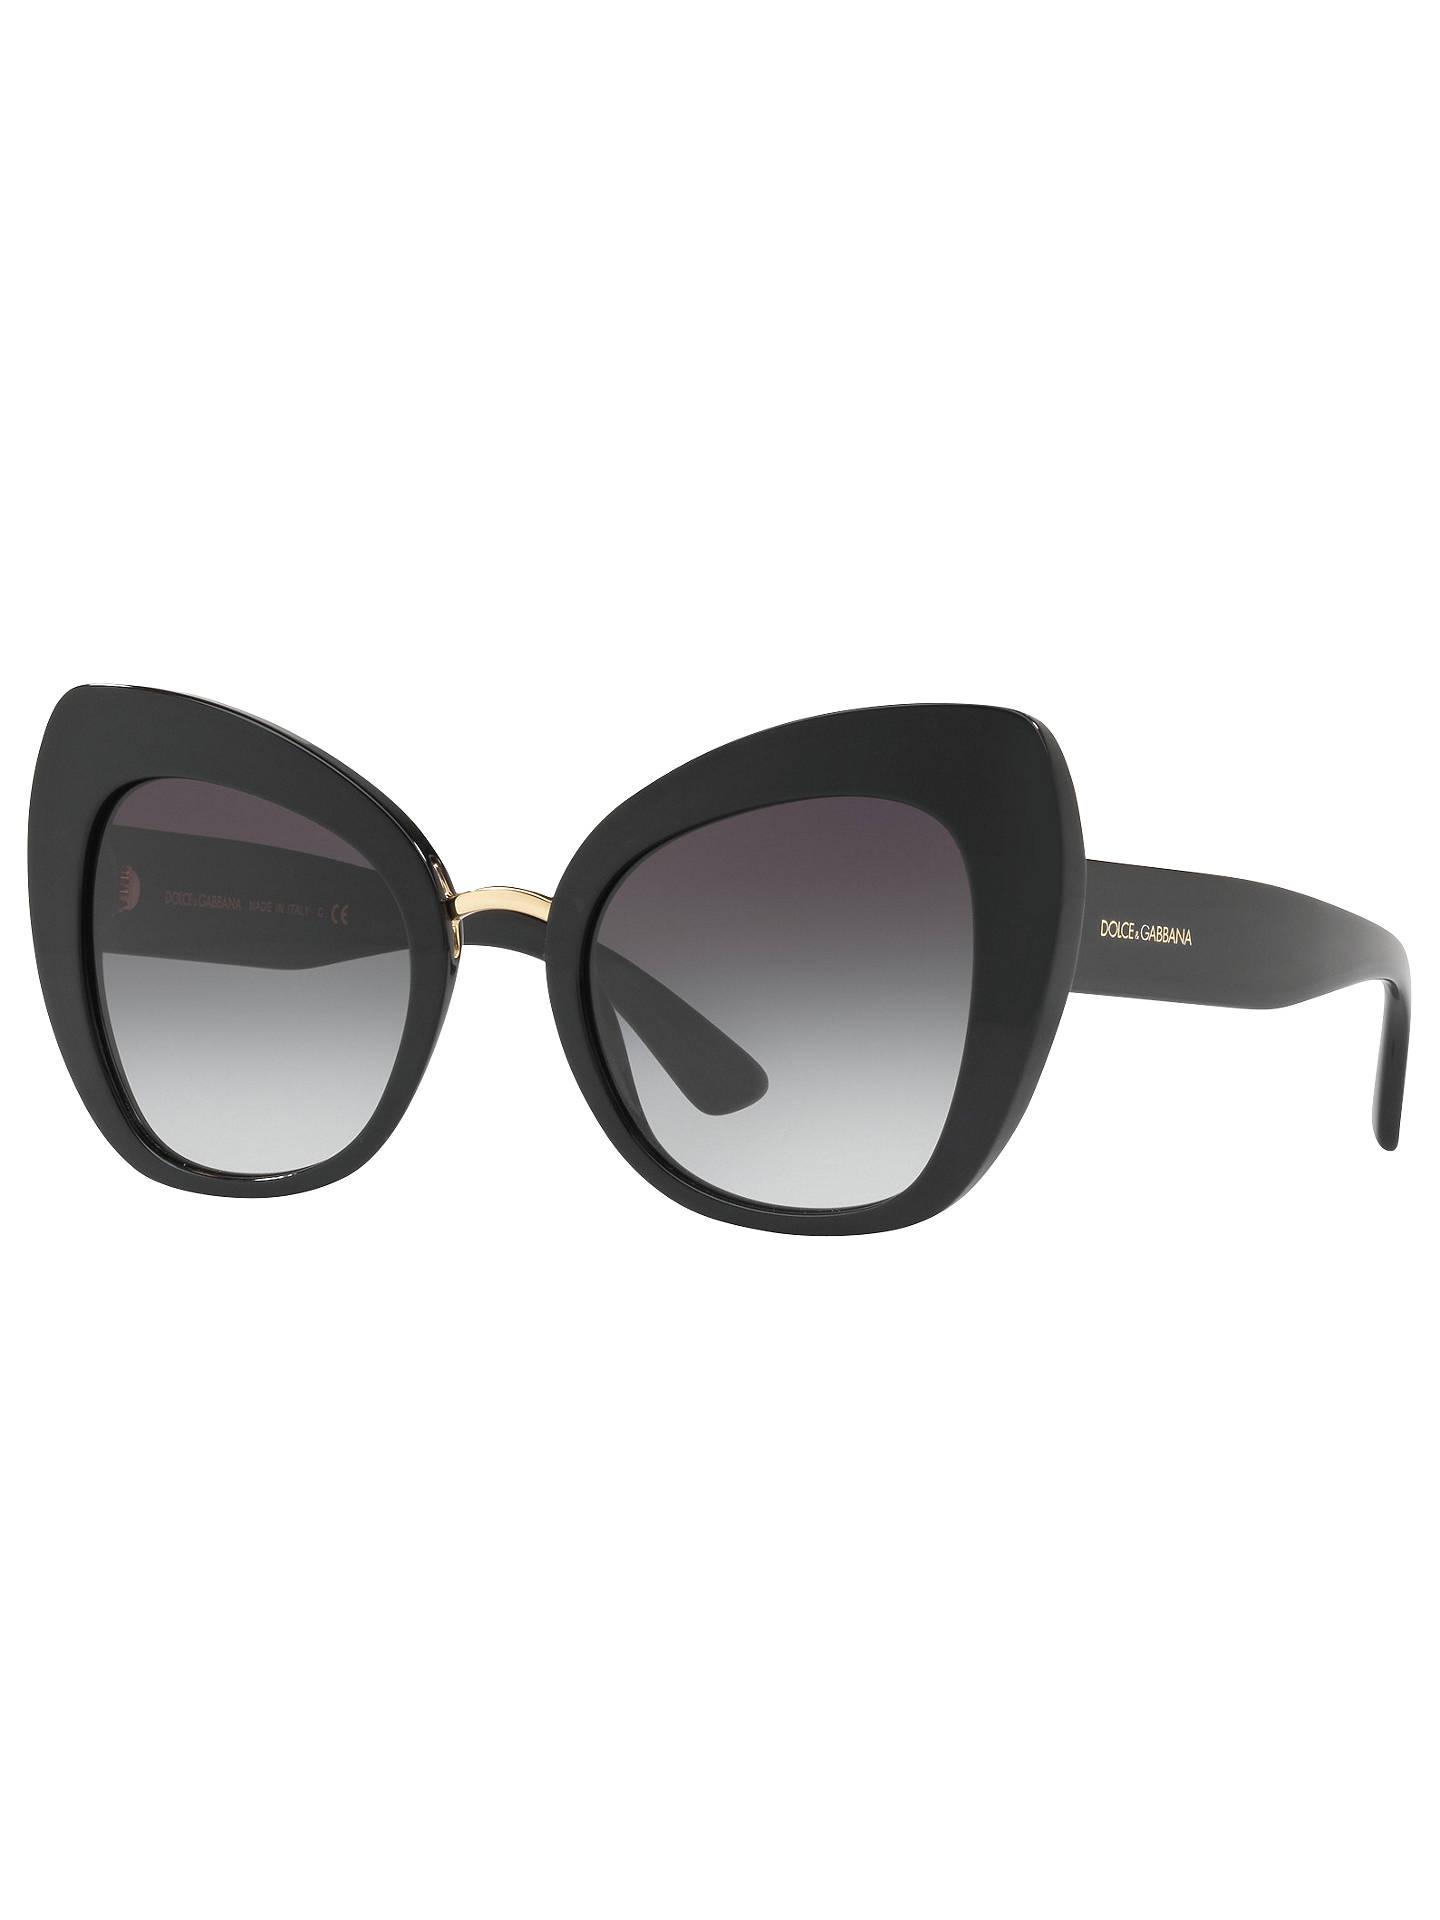 ce7cb473873f Dolce   Gabbana DG4319 Cat s Eye Sunglasses at John Lewis   Partners